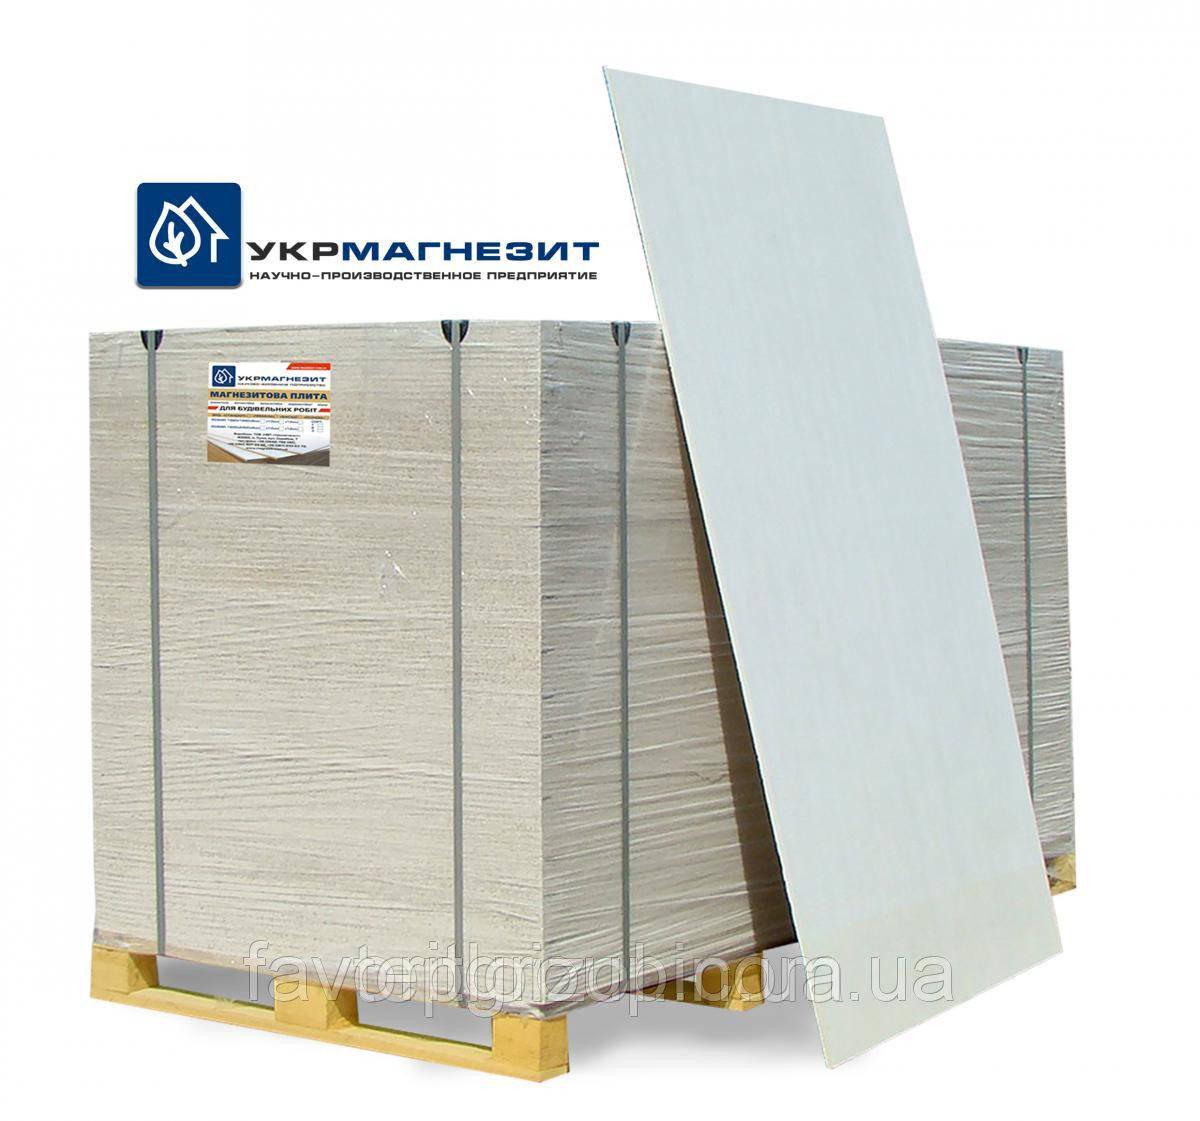 Магнезитовая плита Укрмагнезит Фасад 1 сорт 10х1200х2400 мм